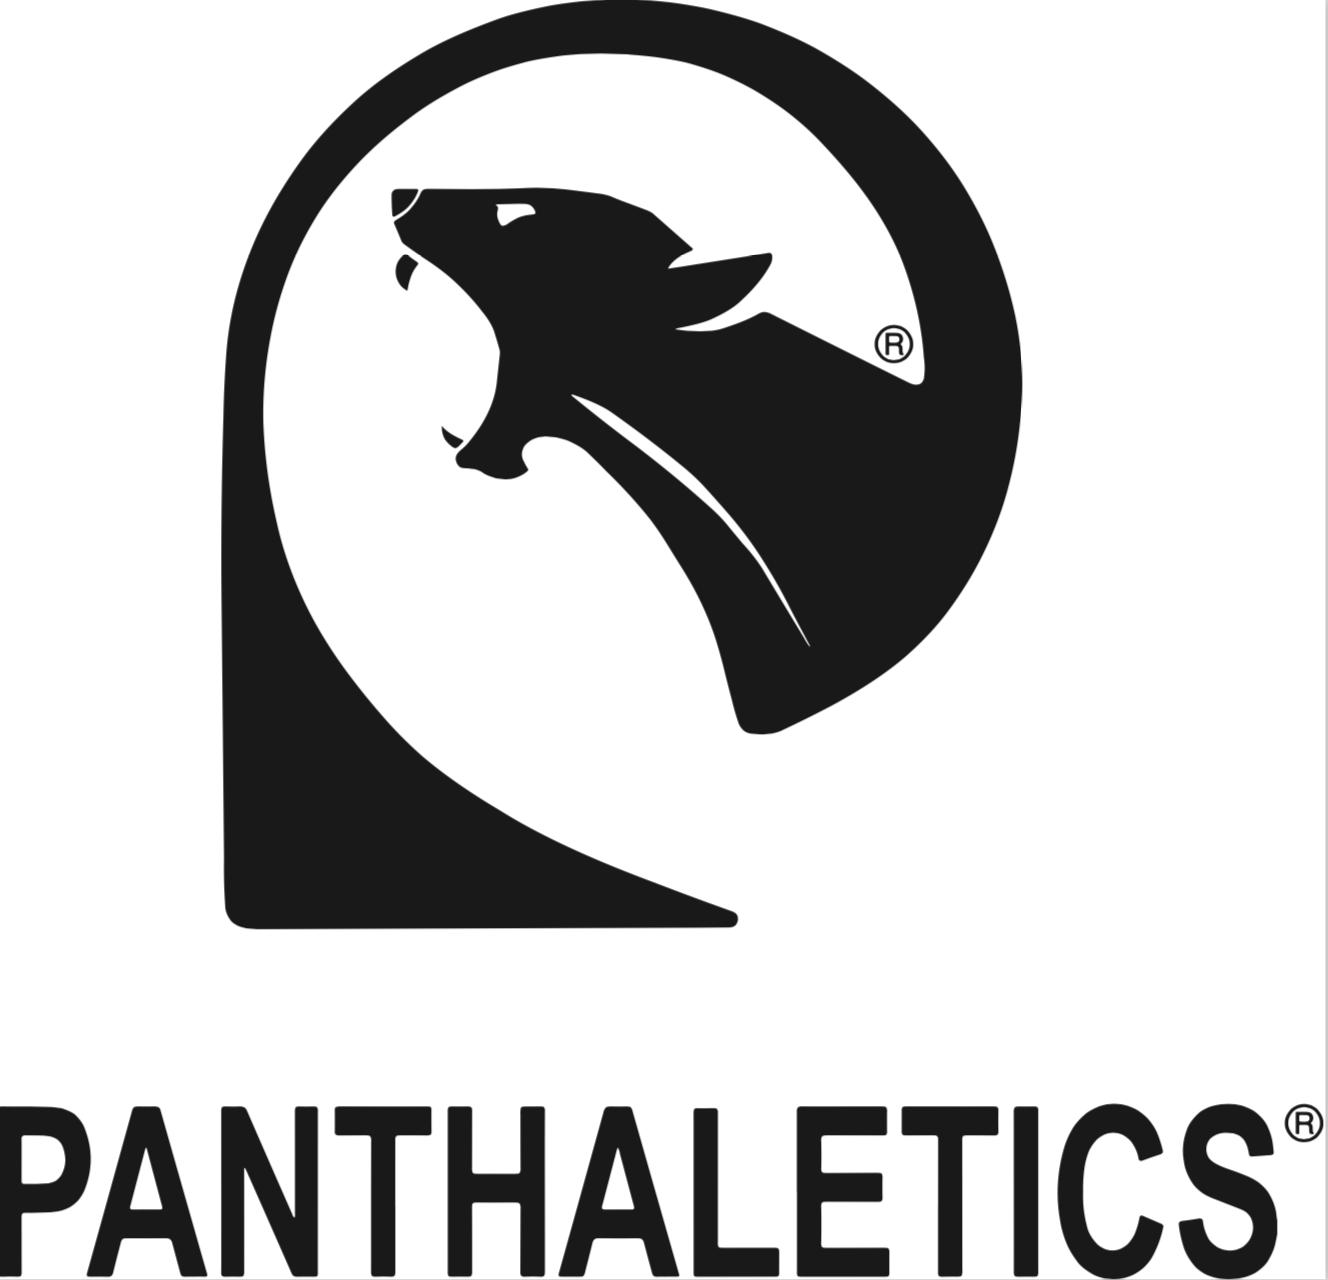 Tanju Colak | Bekannt aus: Panthaletics (CEO)